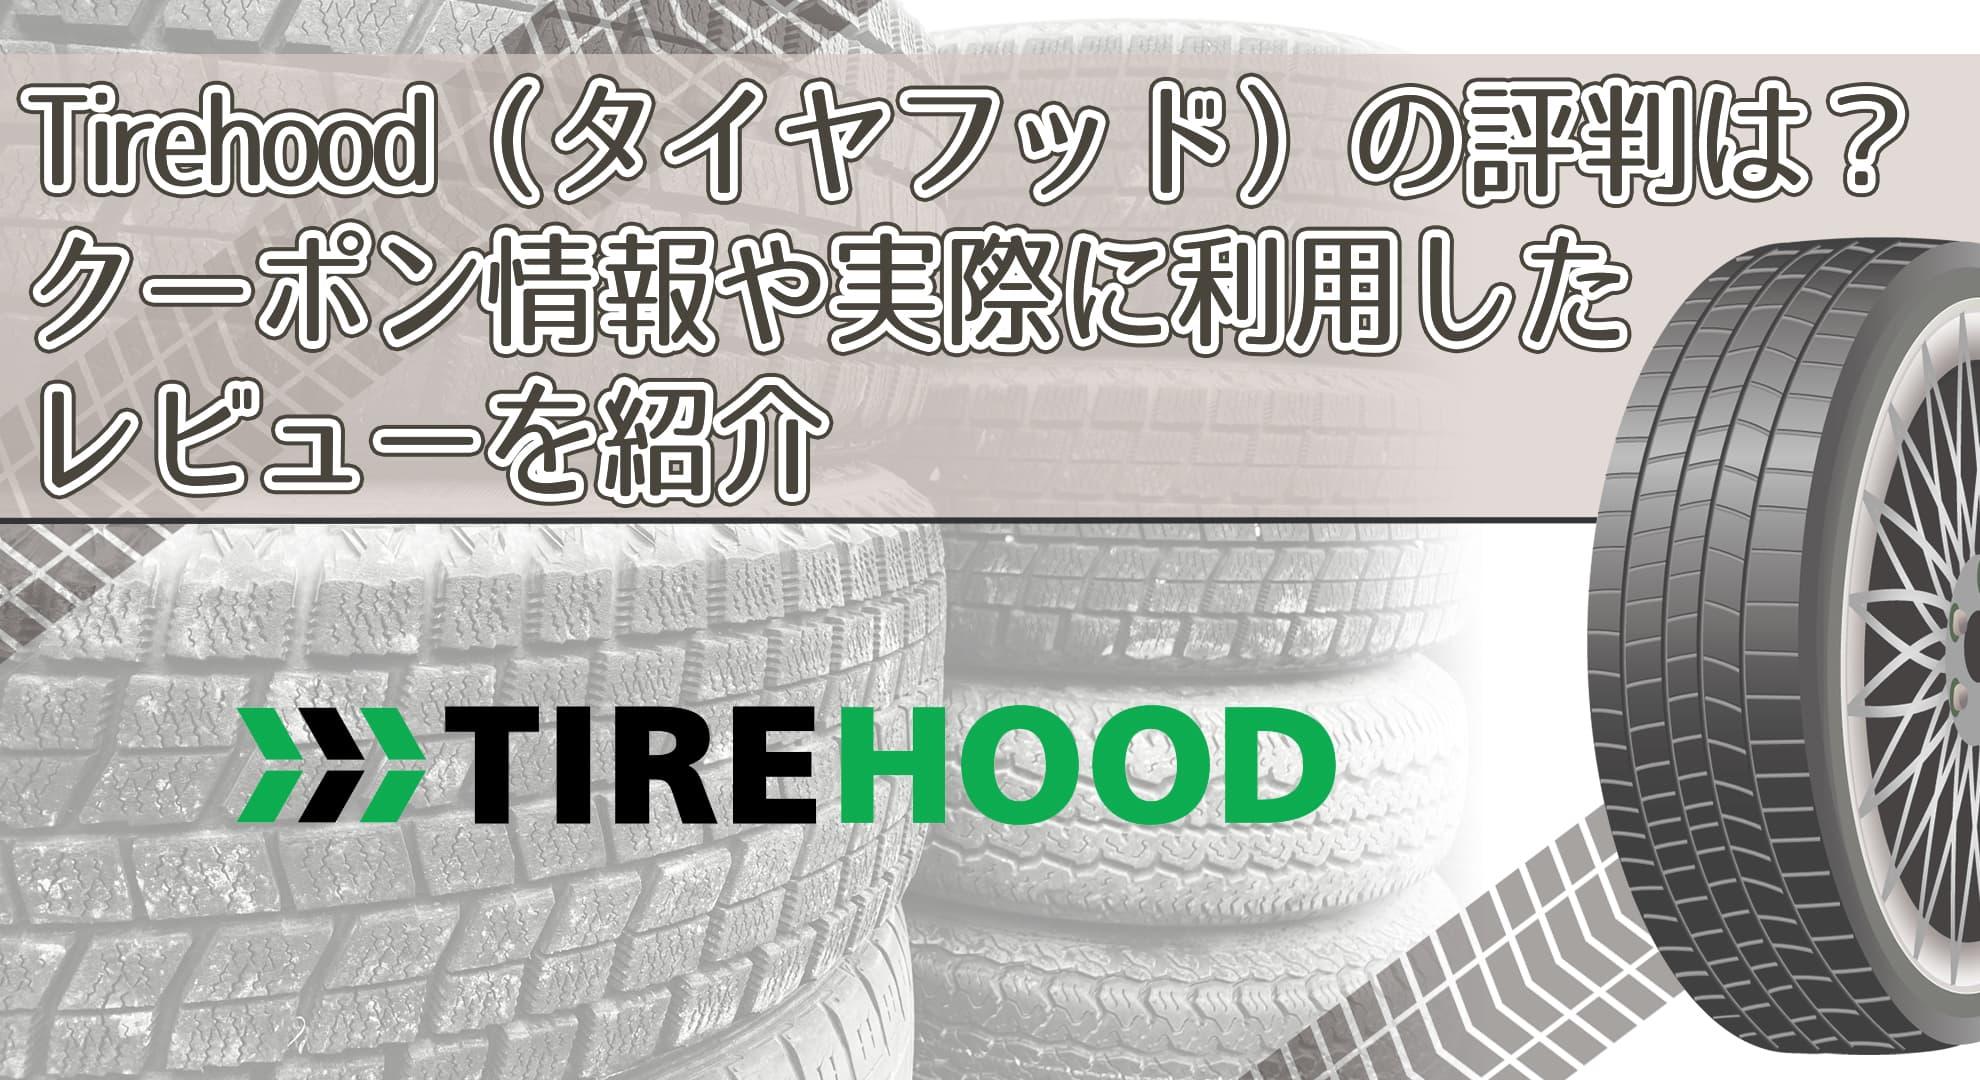 Tirehood(タイヤフッド)の評判は?クーポン情報や実際に利用したレビューを紹介